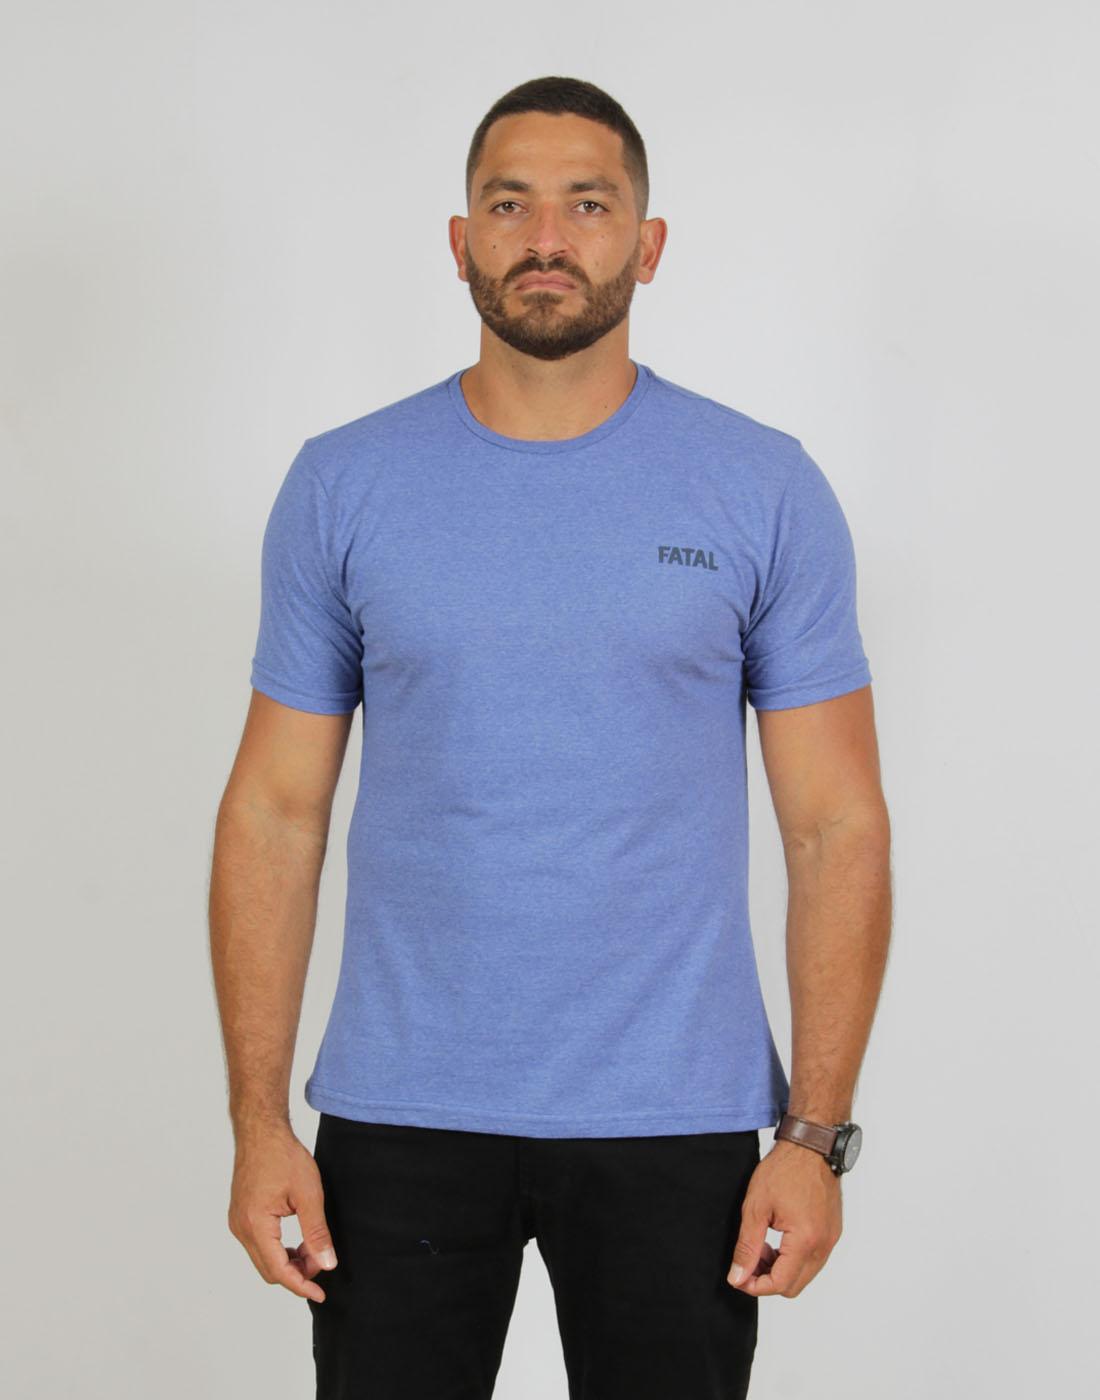 Camiseta Masc. Fashion Basic Azul Violeta Fatal